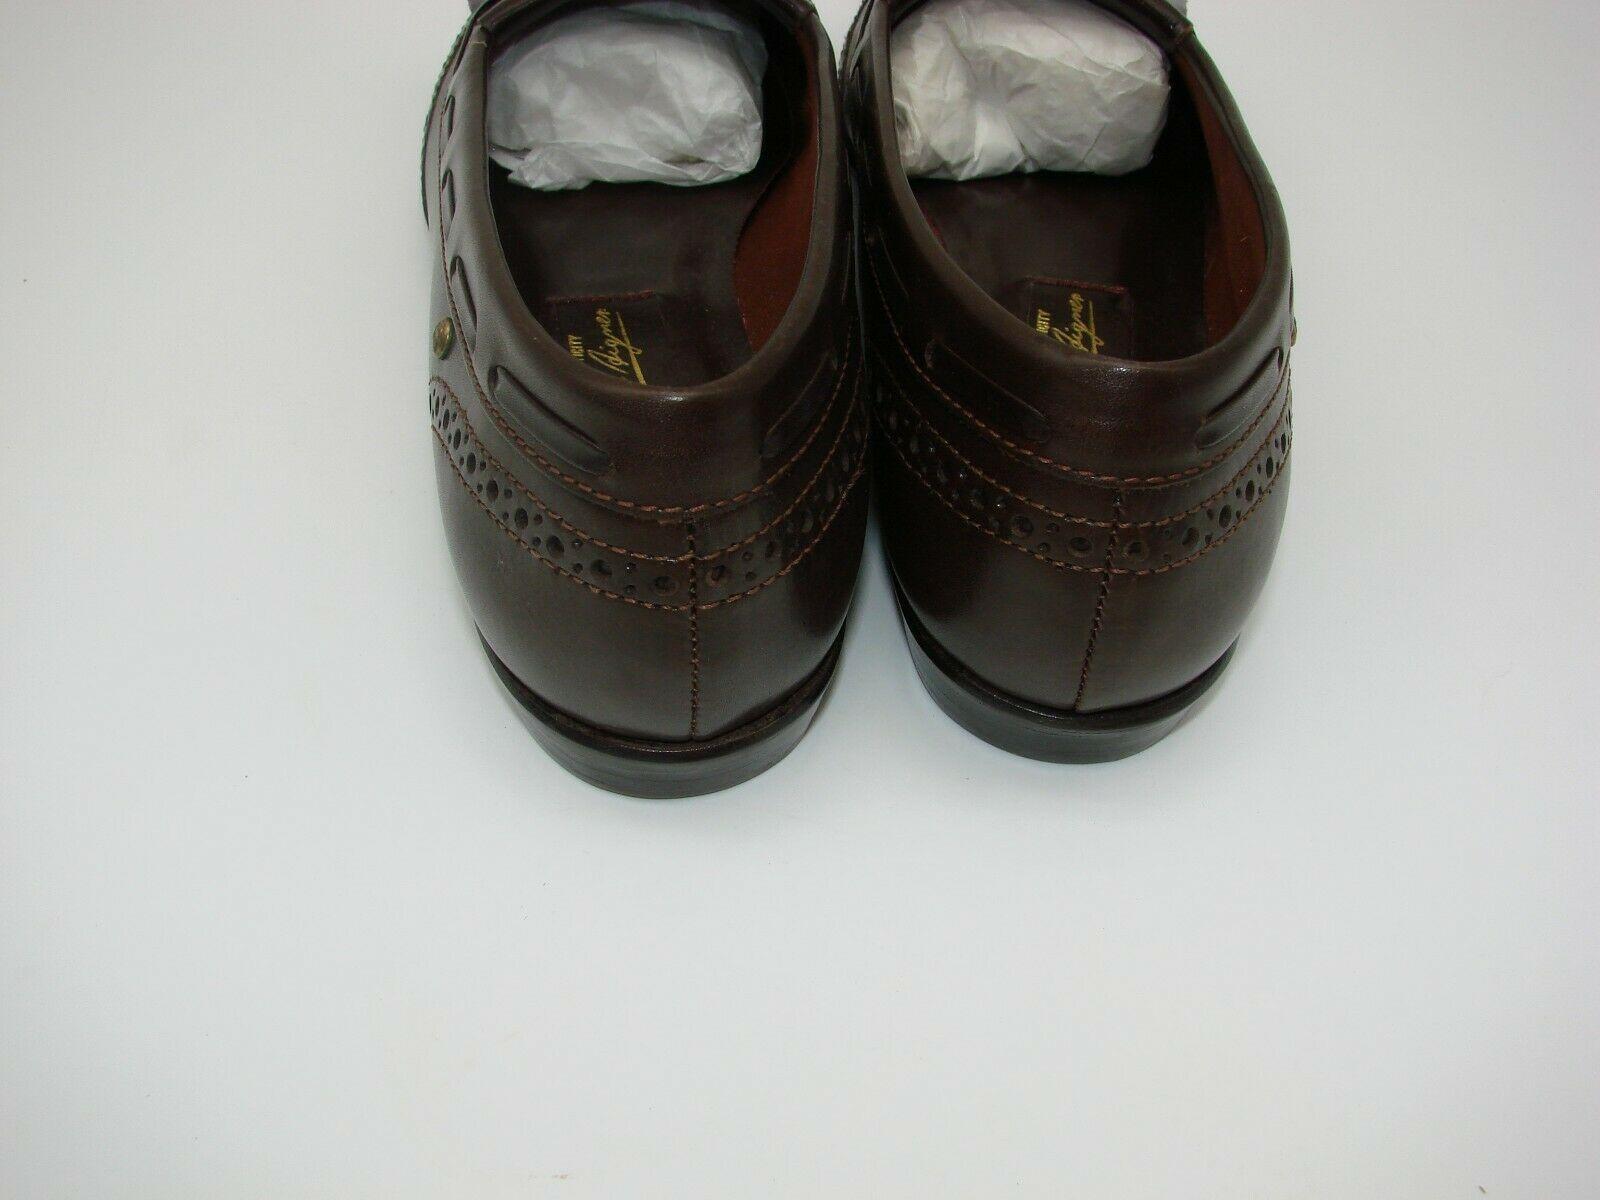 EUC Etienne Aigner Women's Tassel Slip On Pinch Loafers Dress 8 1/2M Brown image 7